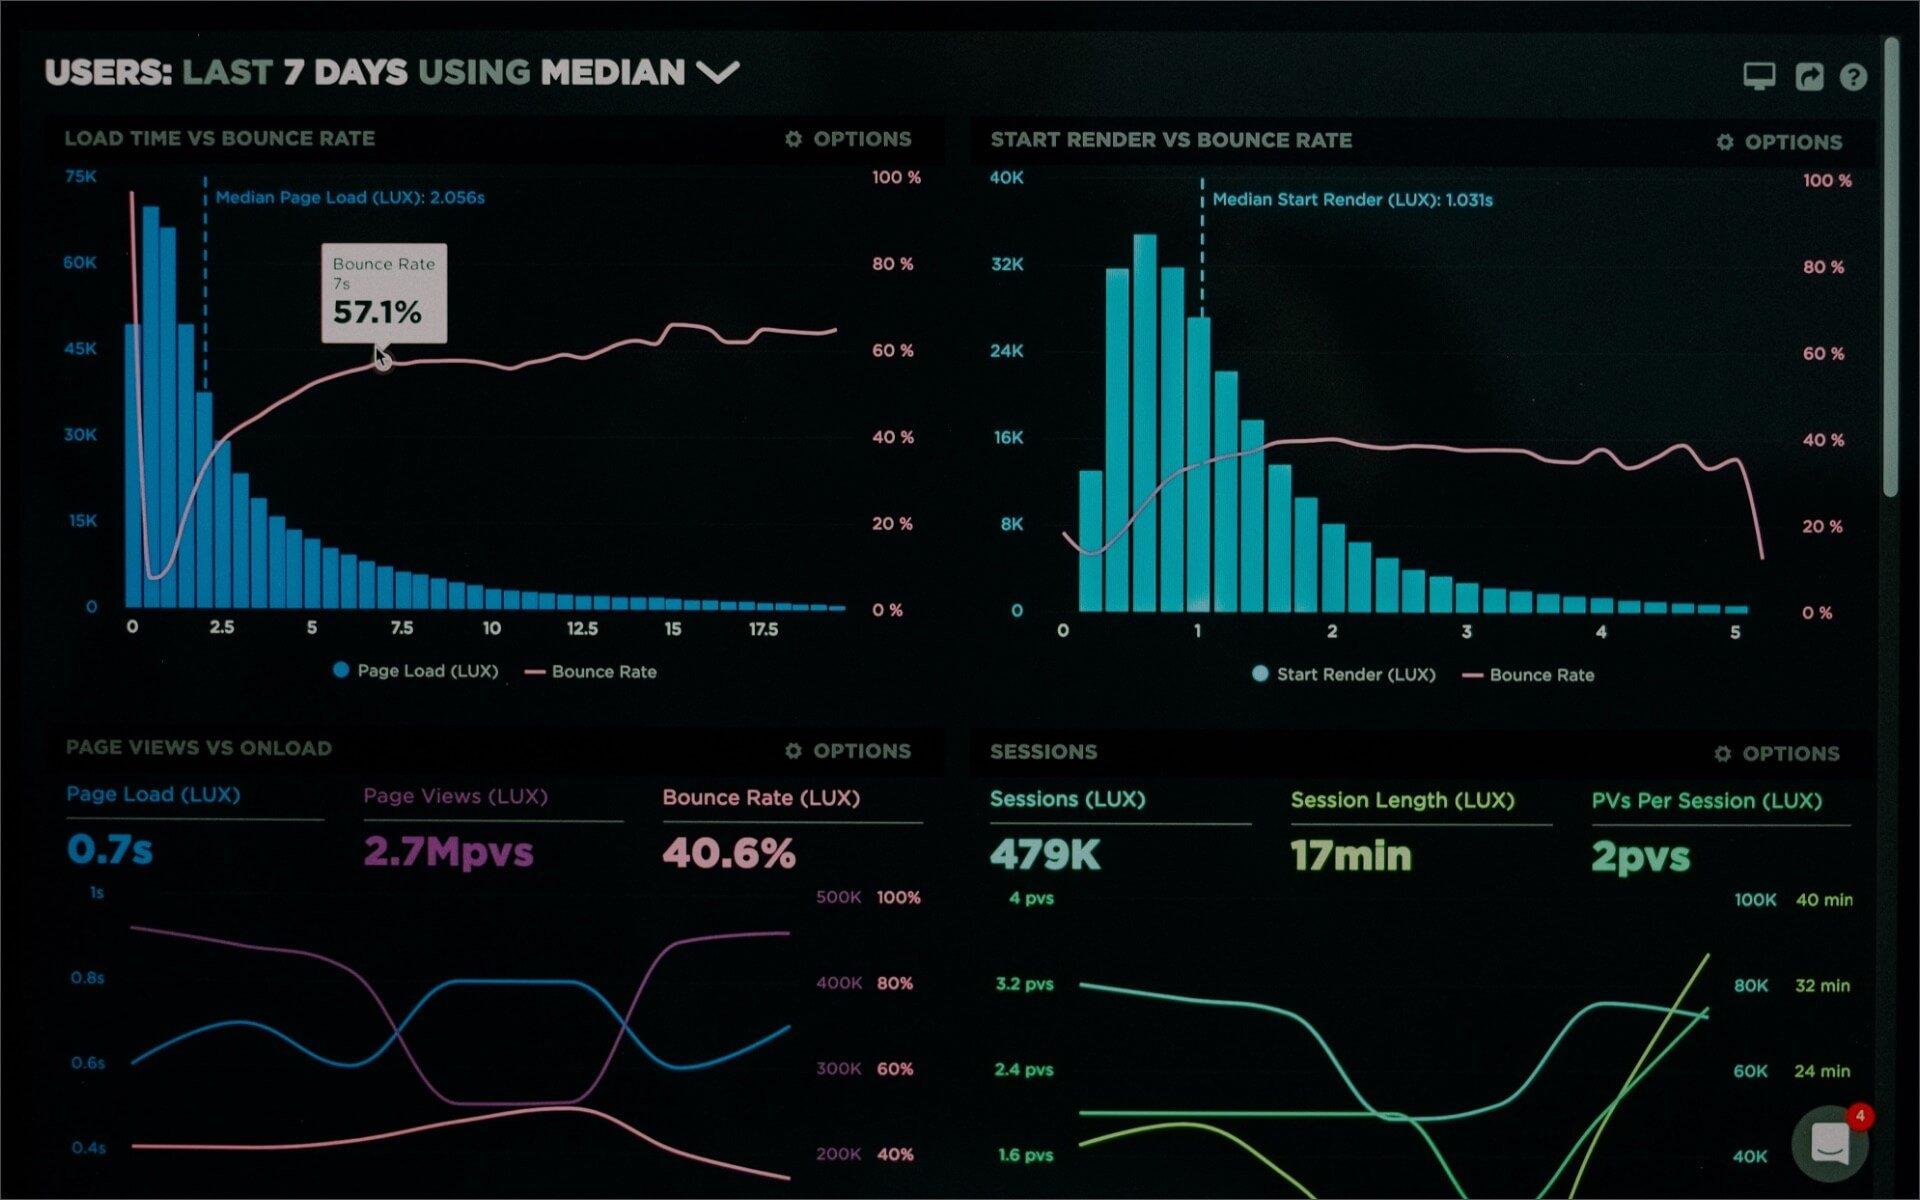 Big Data para la toma de decisiones